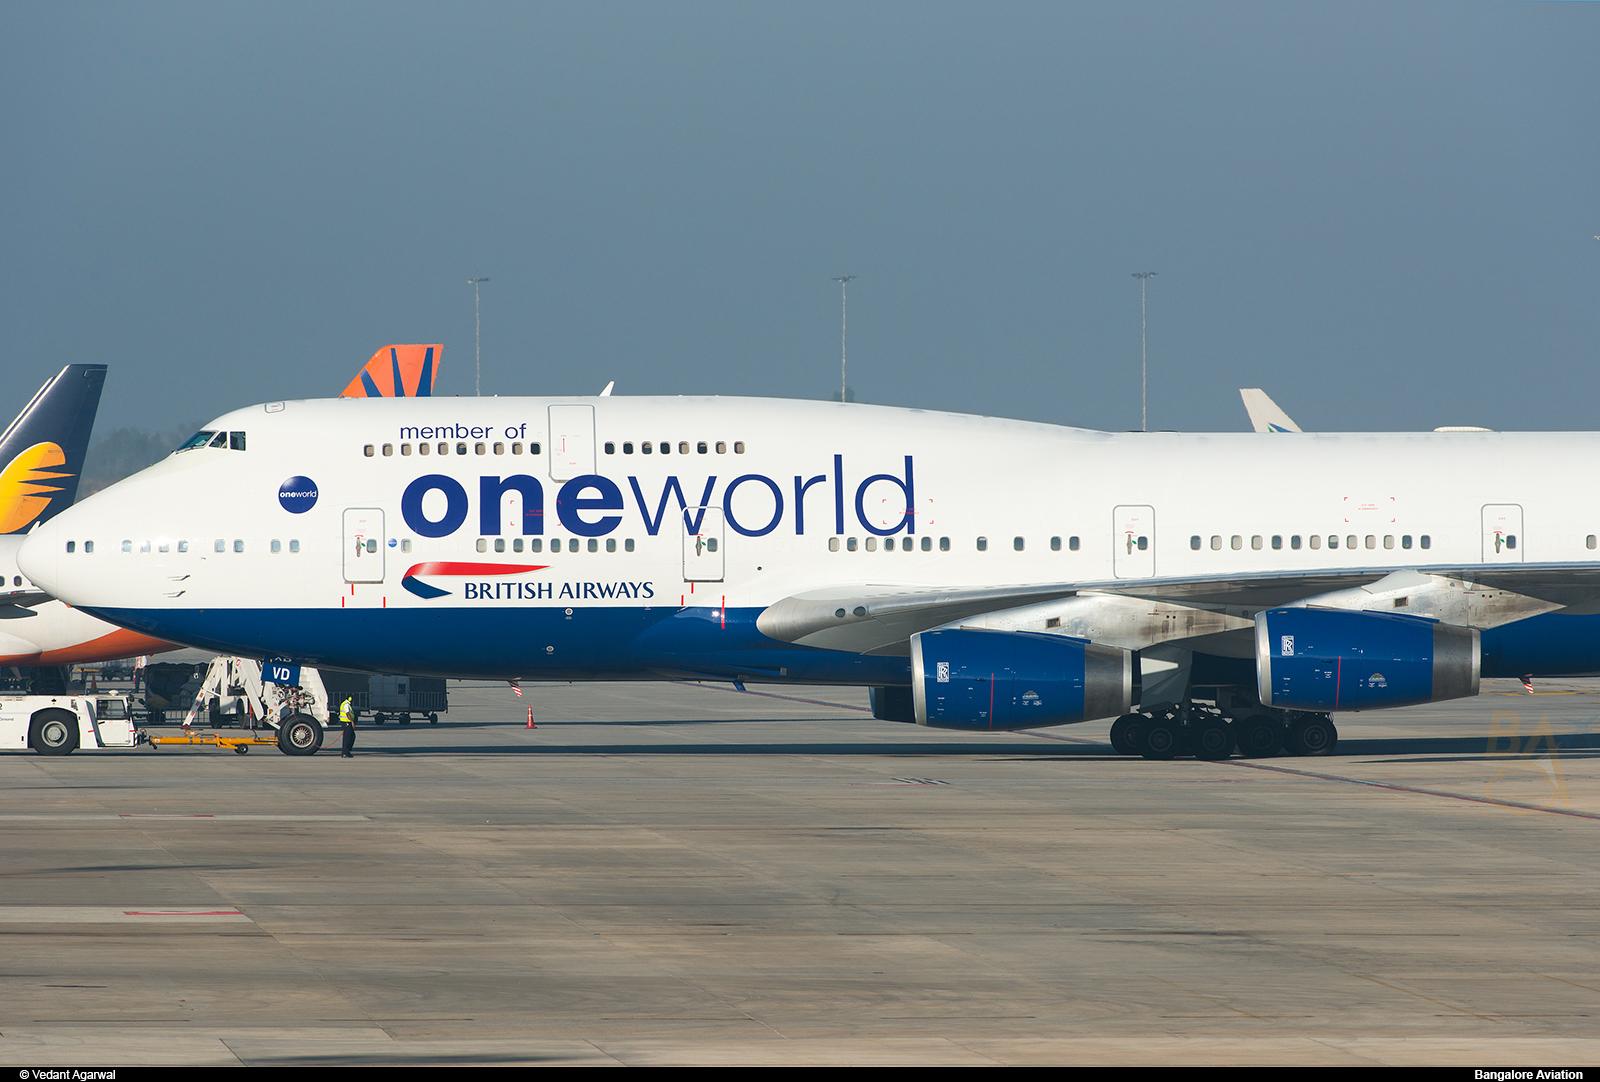 Plane Spotting British Airways Oneworld Livery Air Costa